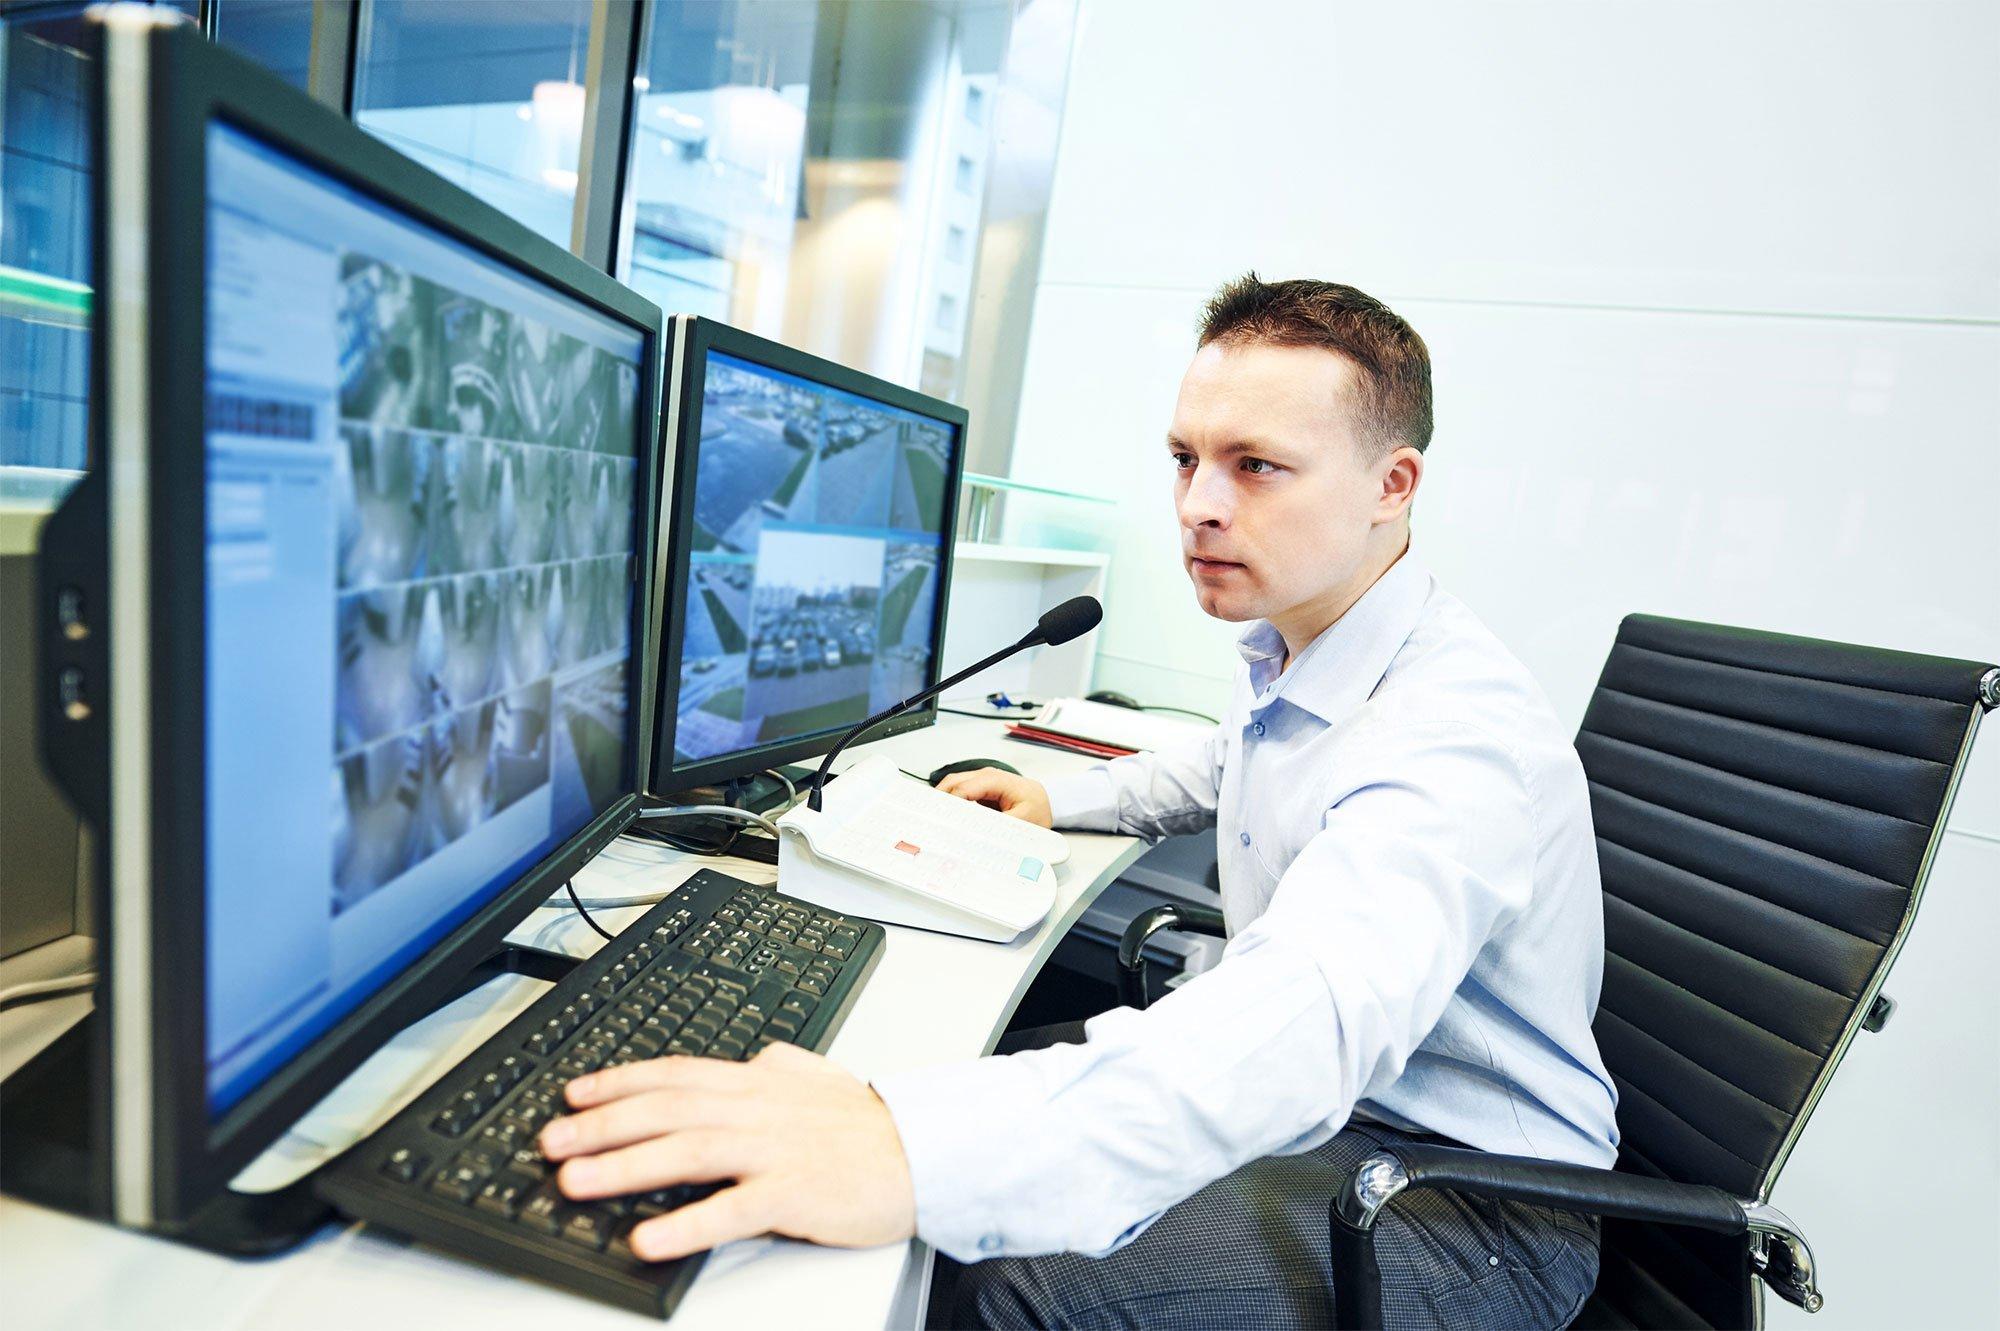 man watching security monitors